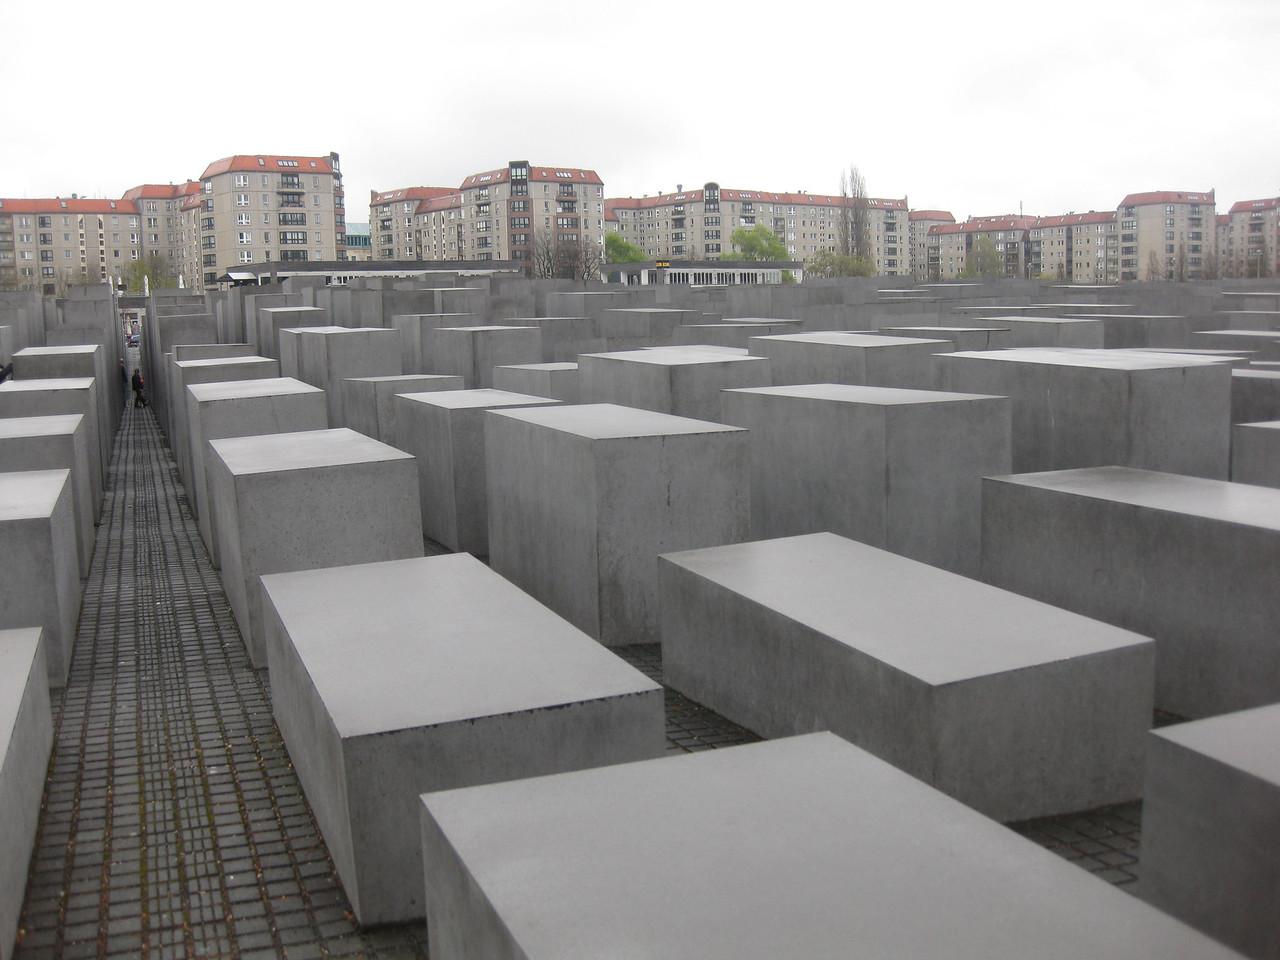 The Holocaust Memorial near the Brandenburger Tor.  Very powerful.